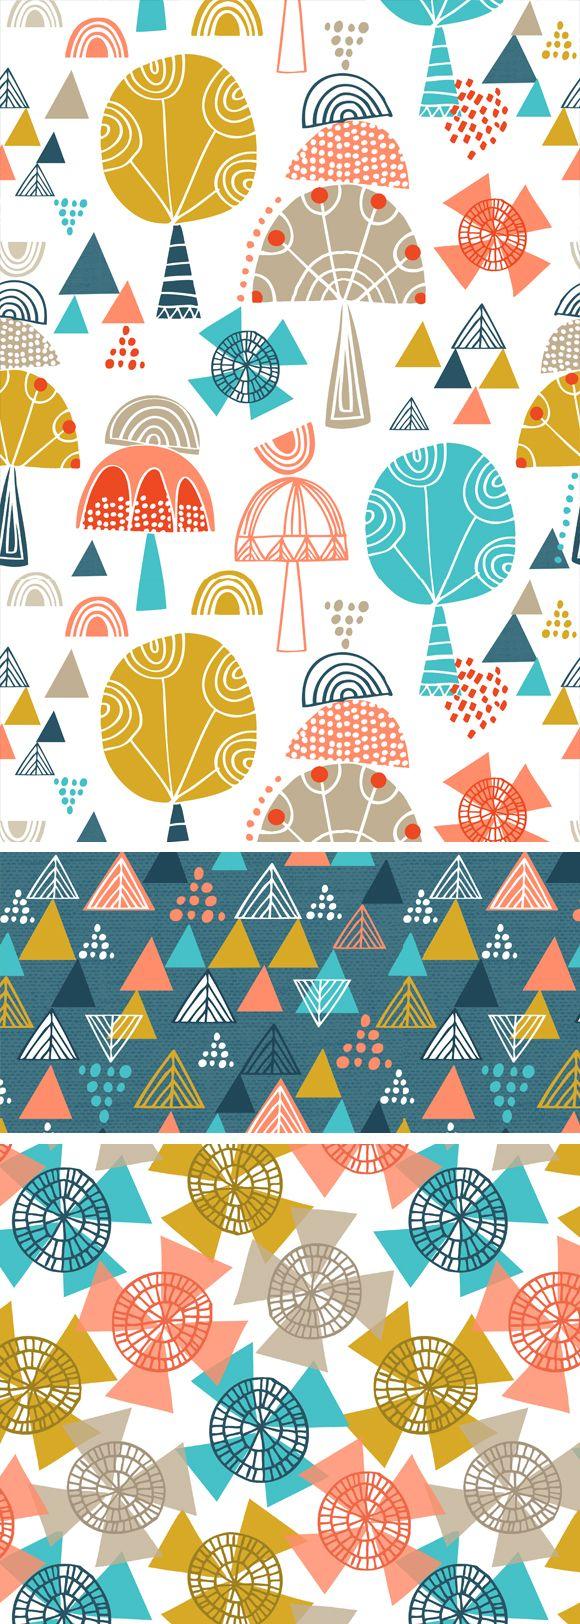 wendy kendall designs – freelance surface pattern designer » totem trees